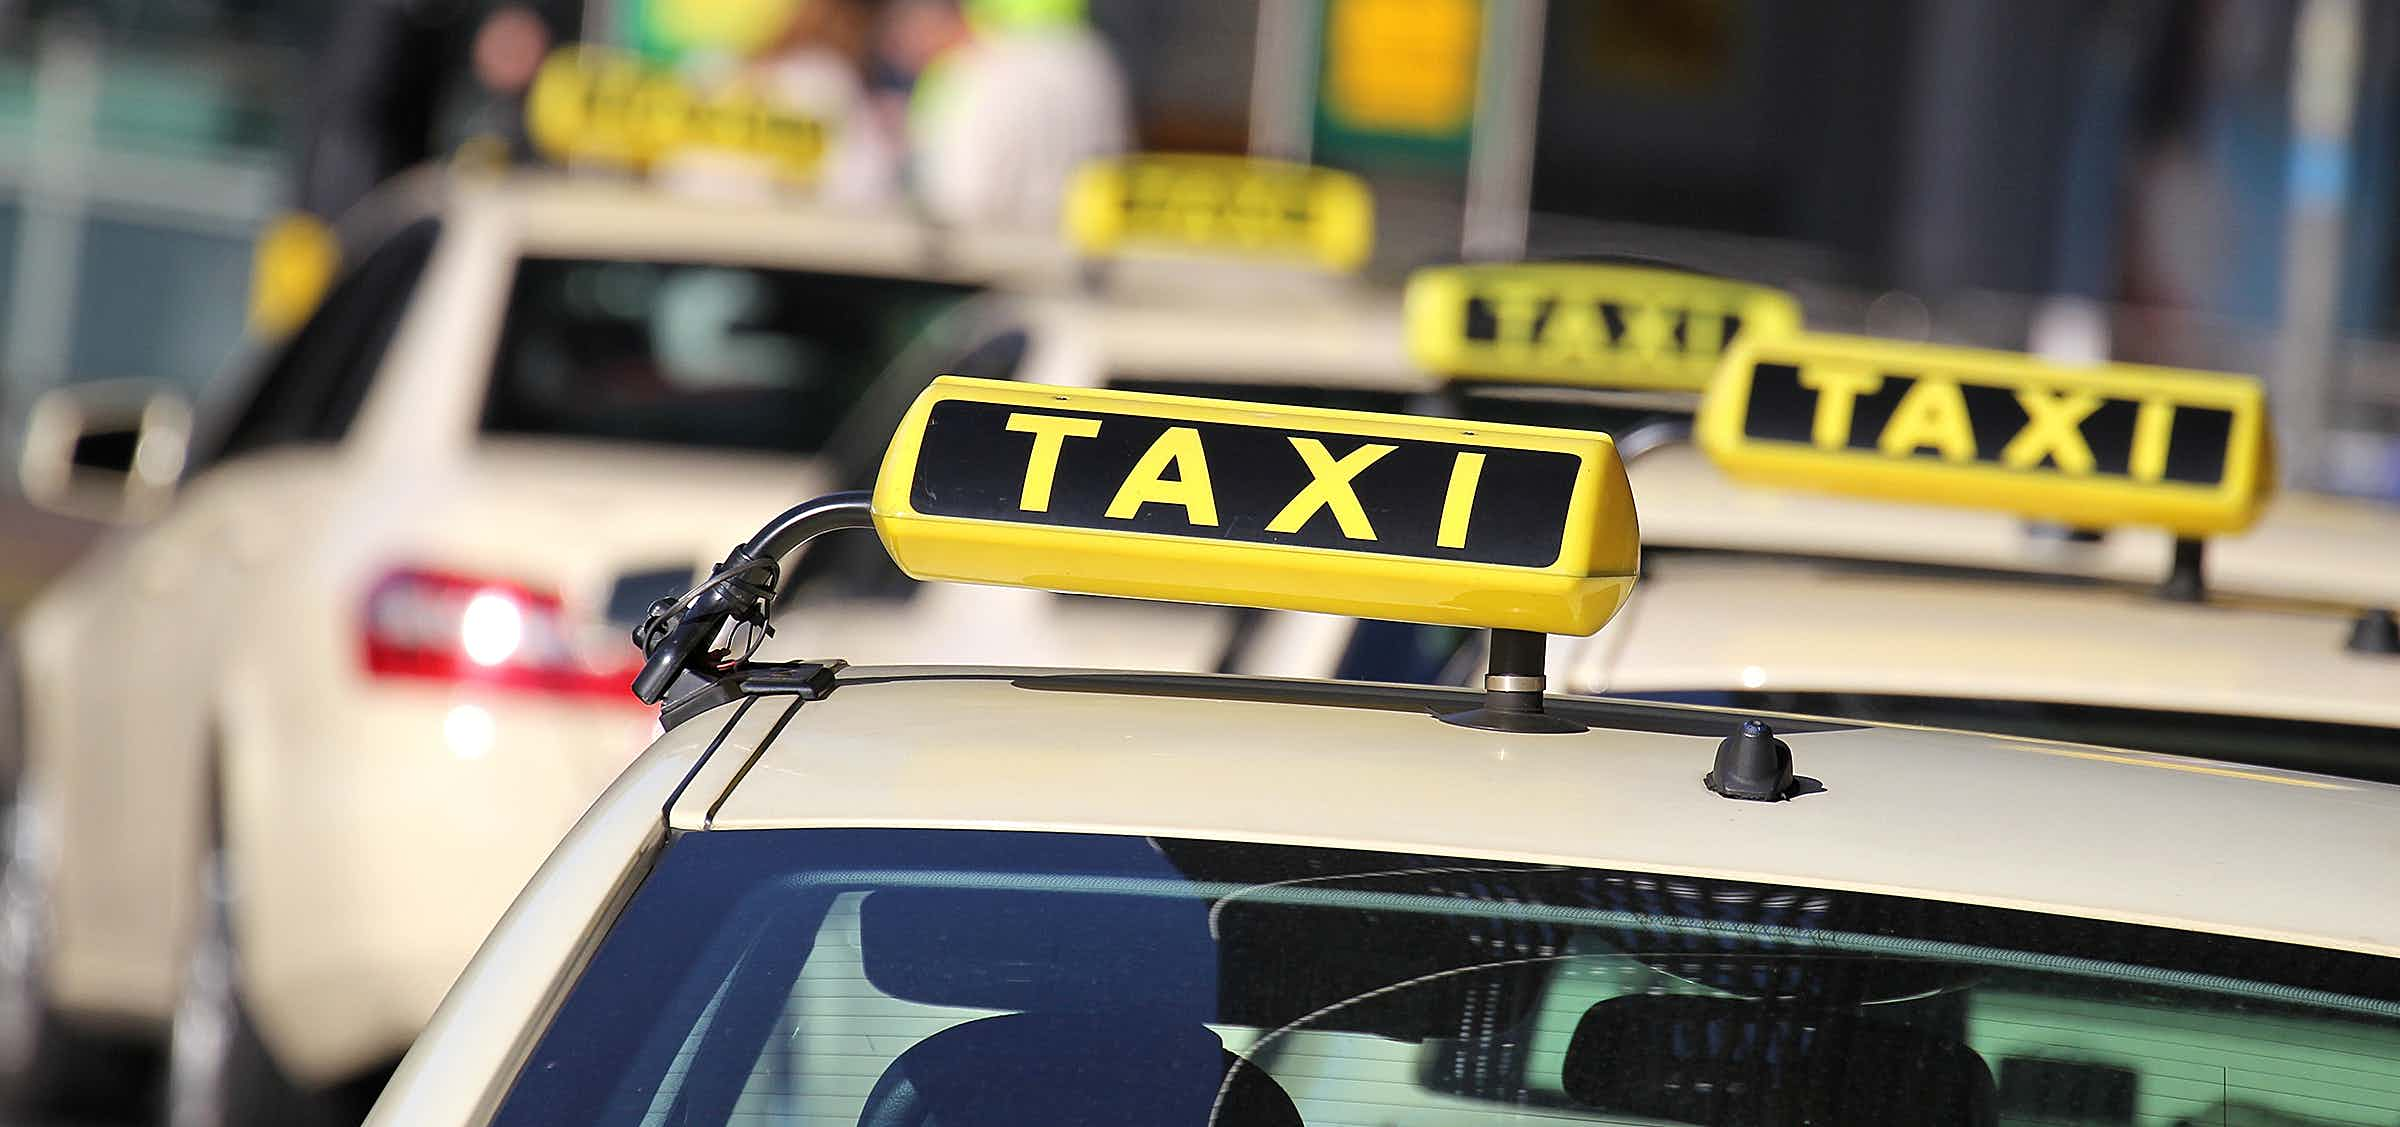 Kassensystem Taxi